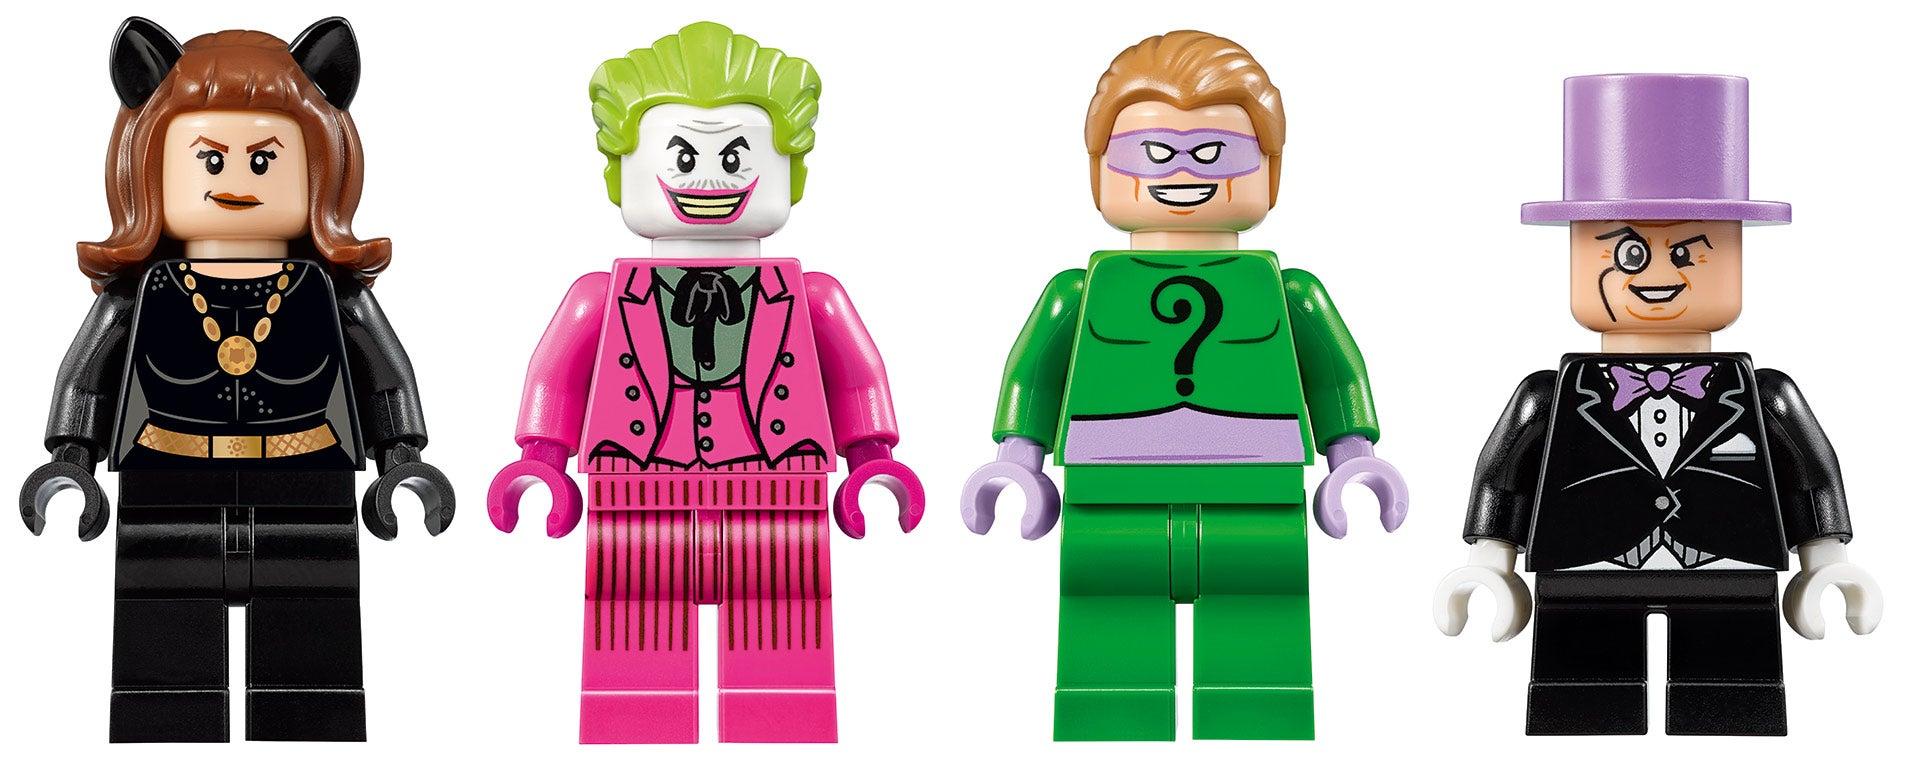 The LEGO Classic TV Series Batcave Has All The '60s Batman